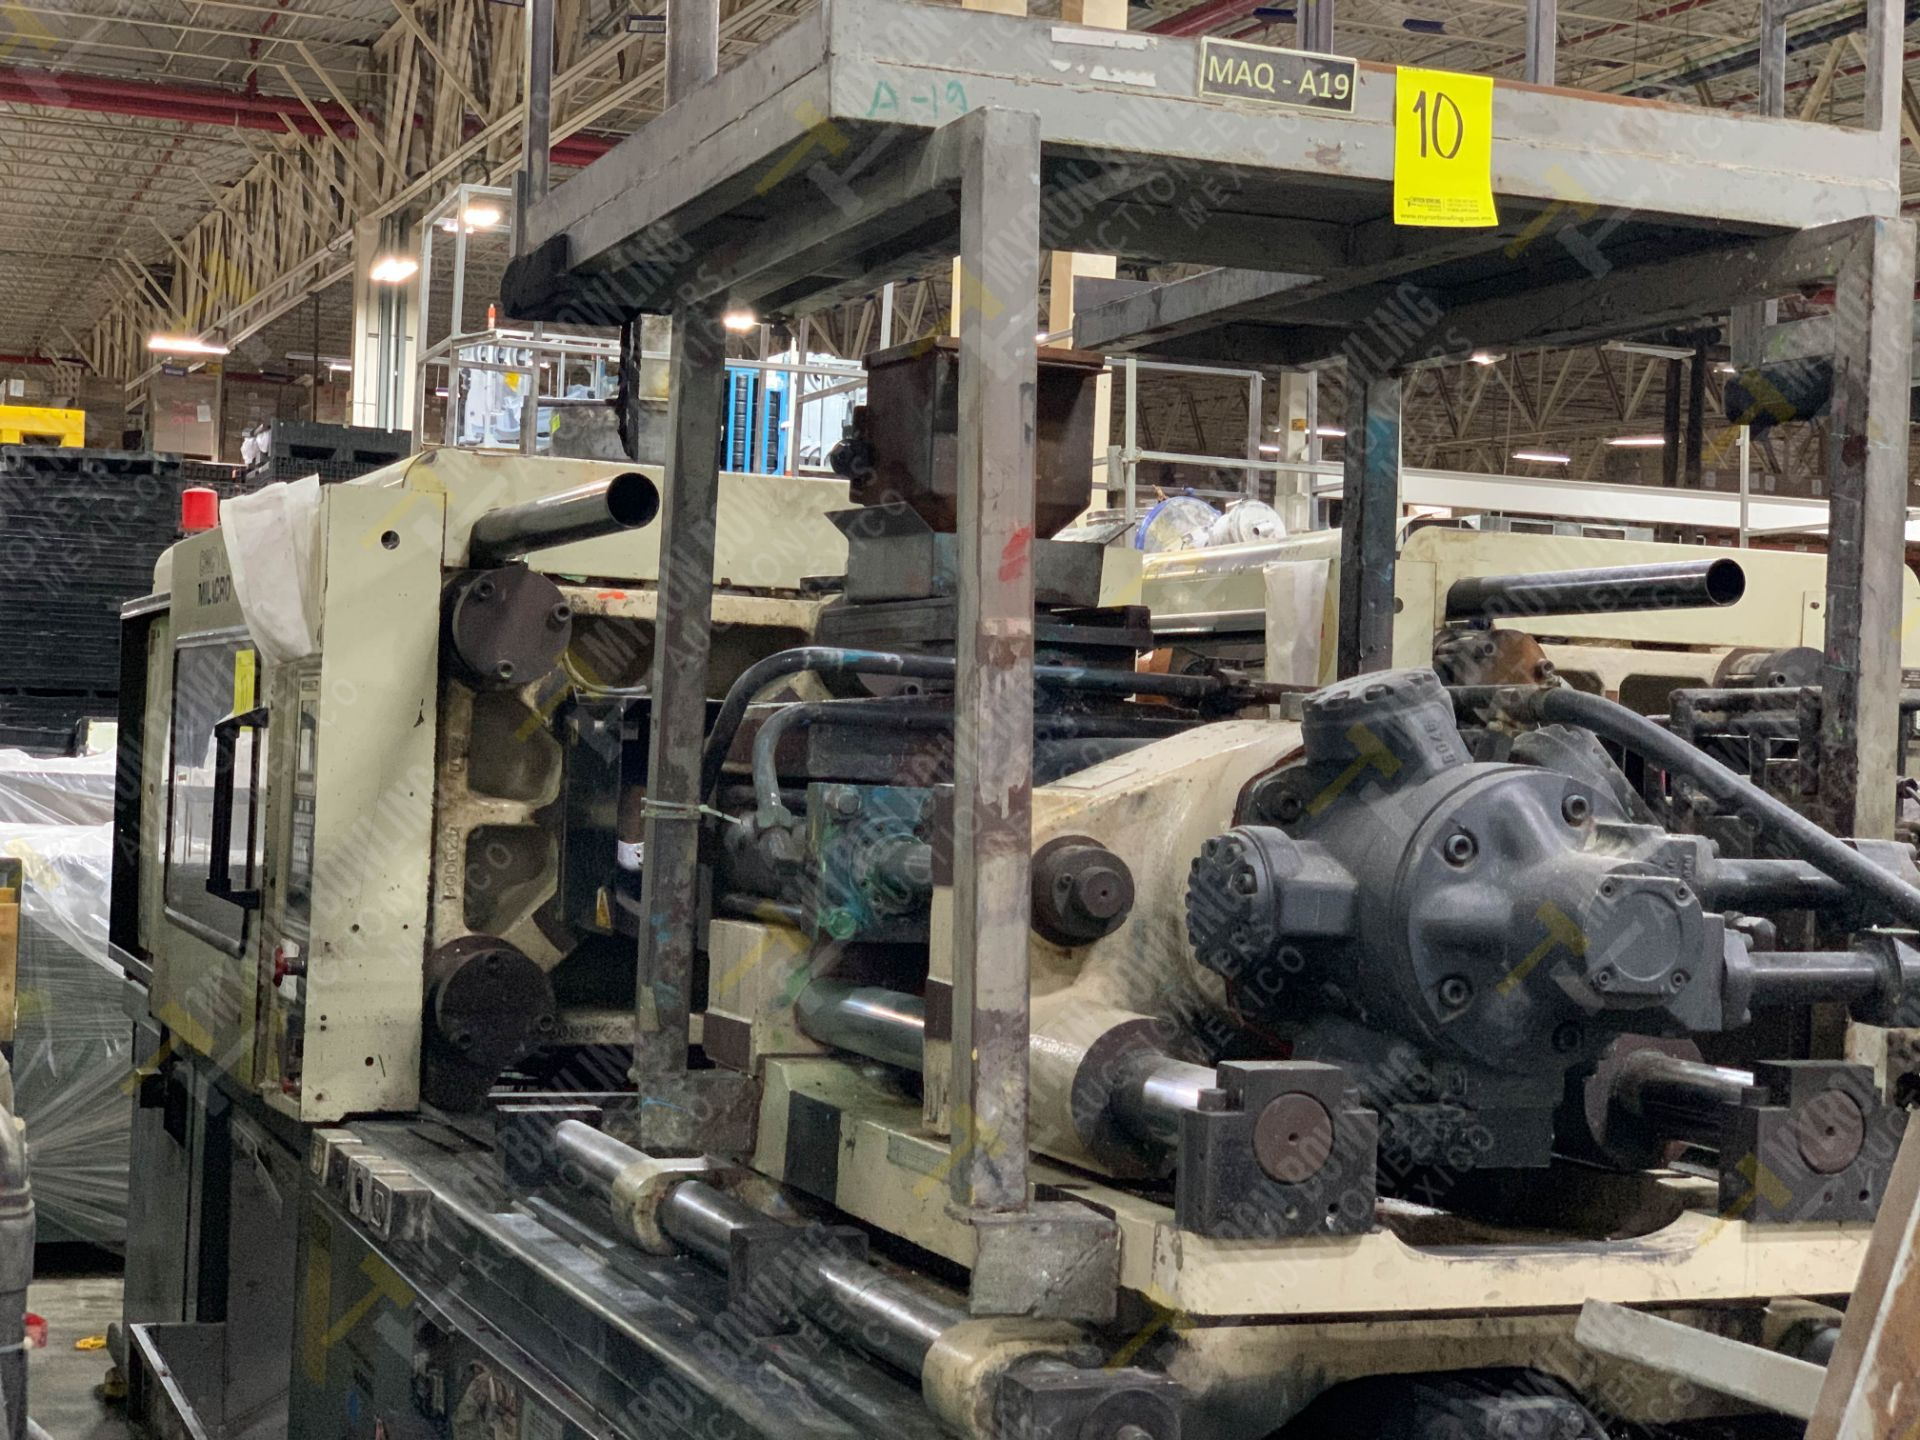 Lot 10 - 220 TON CINCINNATI MILACRON VT-220-20 PLASTIC INJECTION MOLDING MACHINE, MFG YEAR 1994